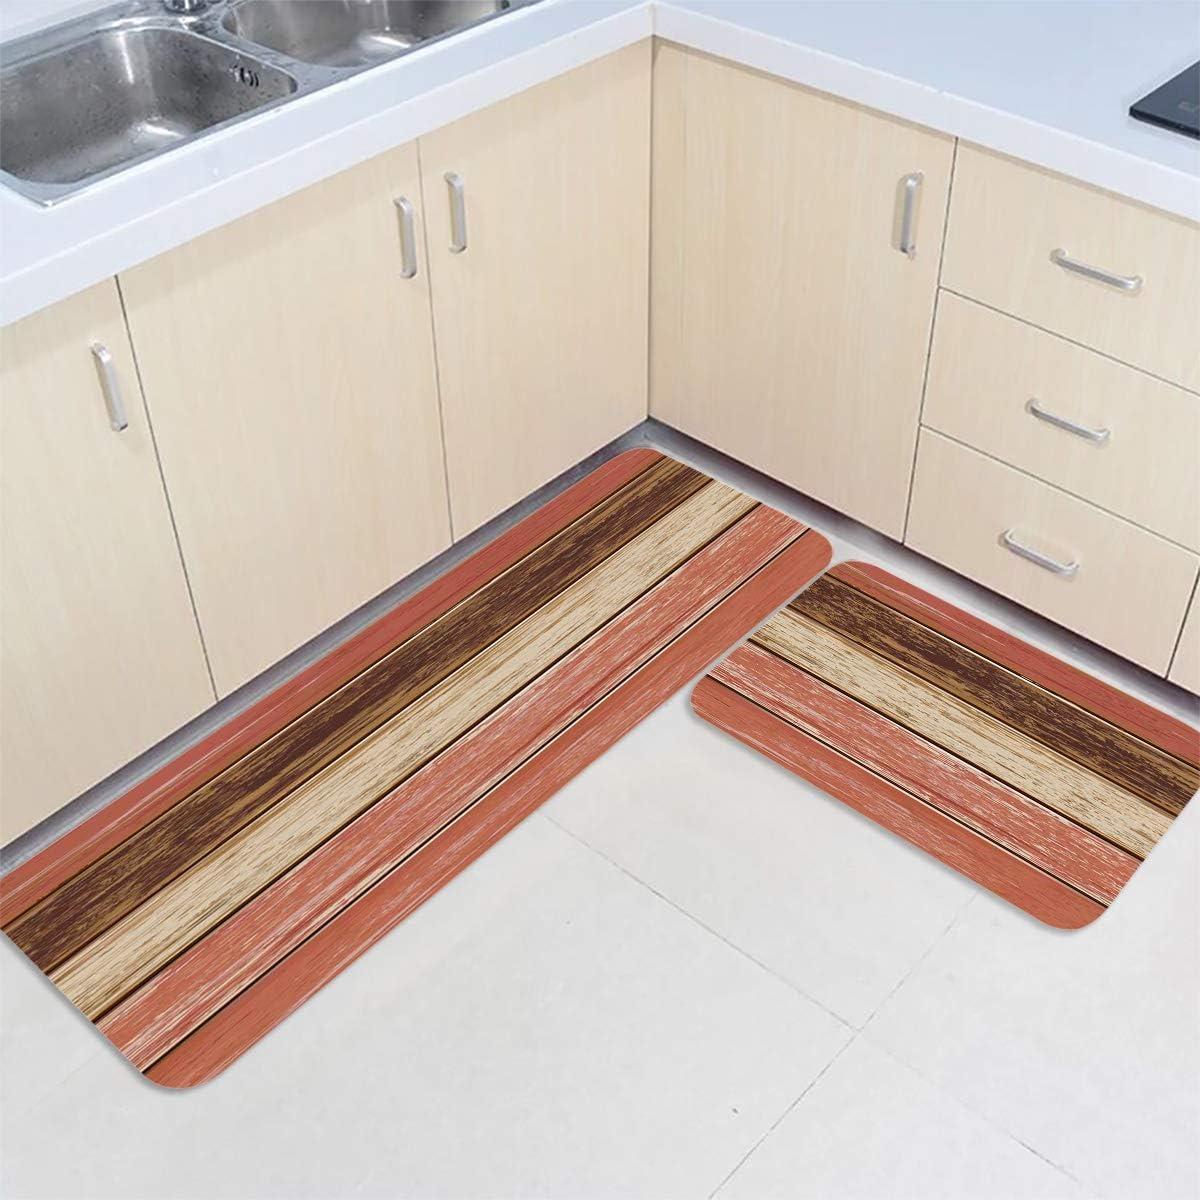 Anti Fatigue Kitchen Mat Set Waterproof cheap of 2 Rustic Industry No. 1 Mats